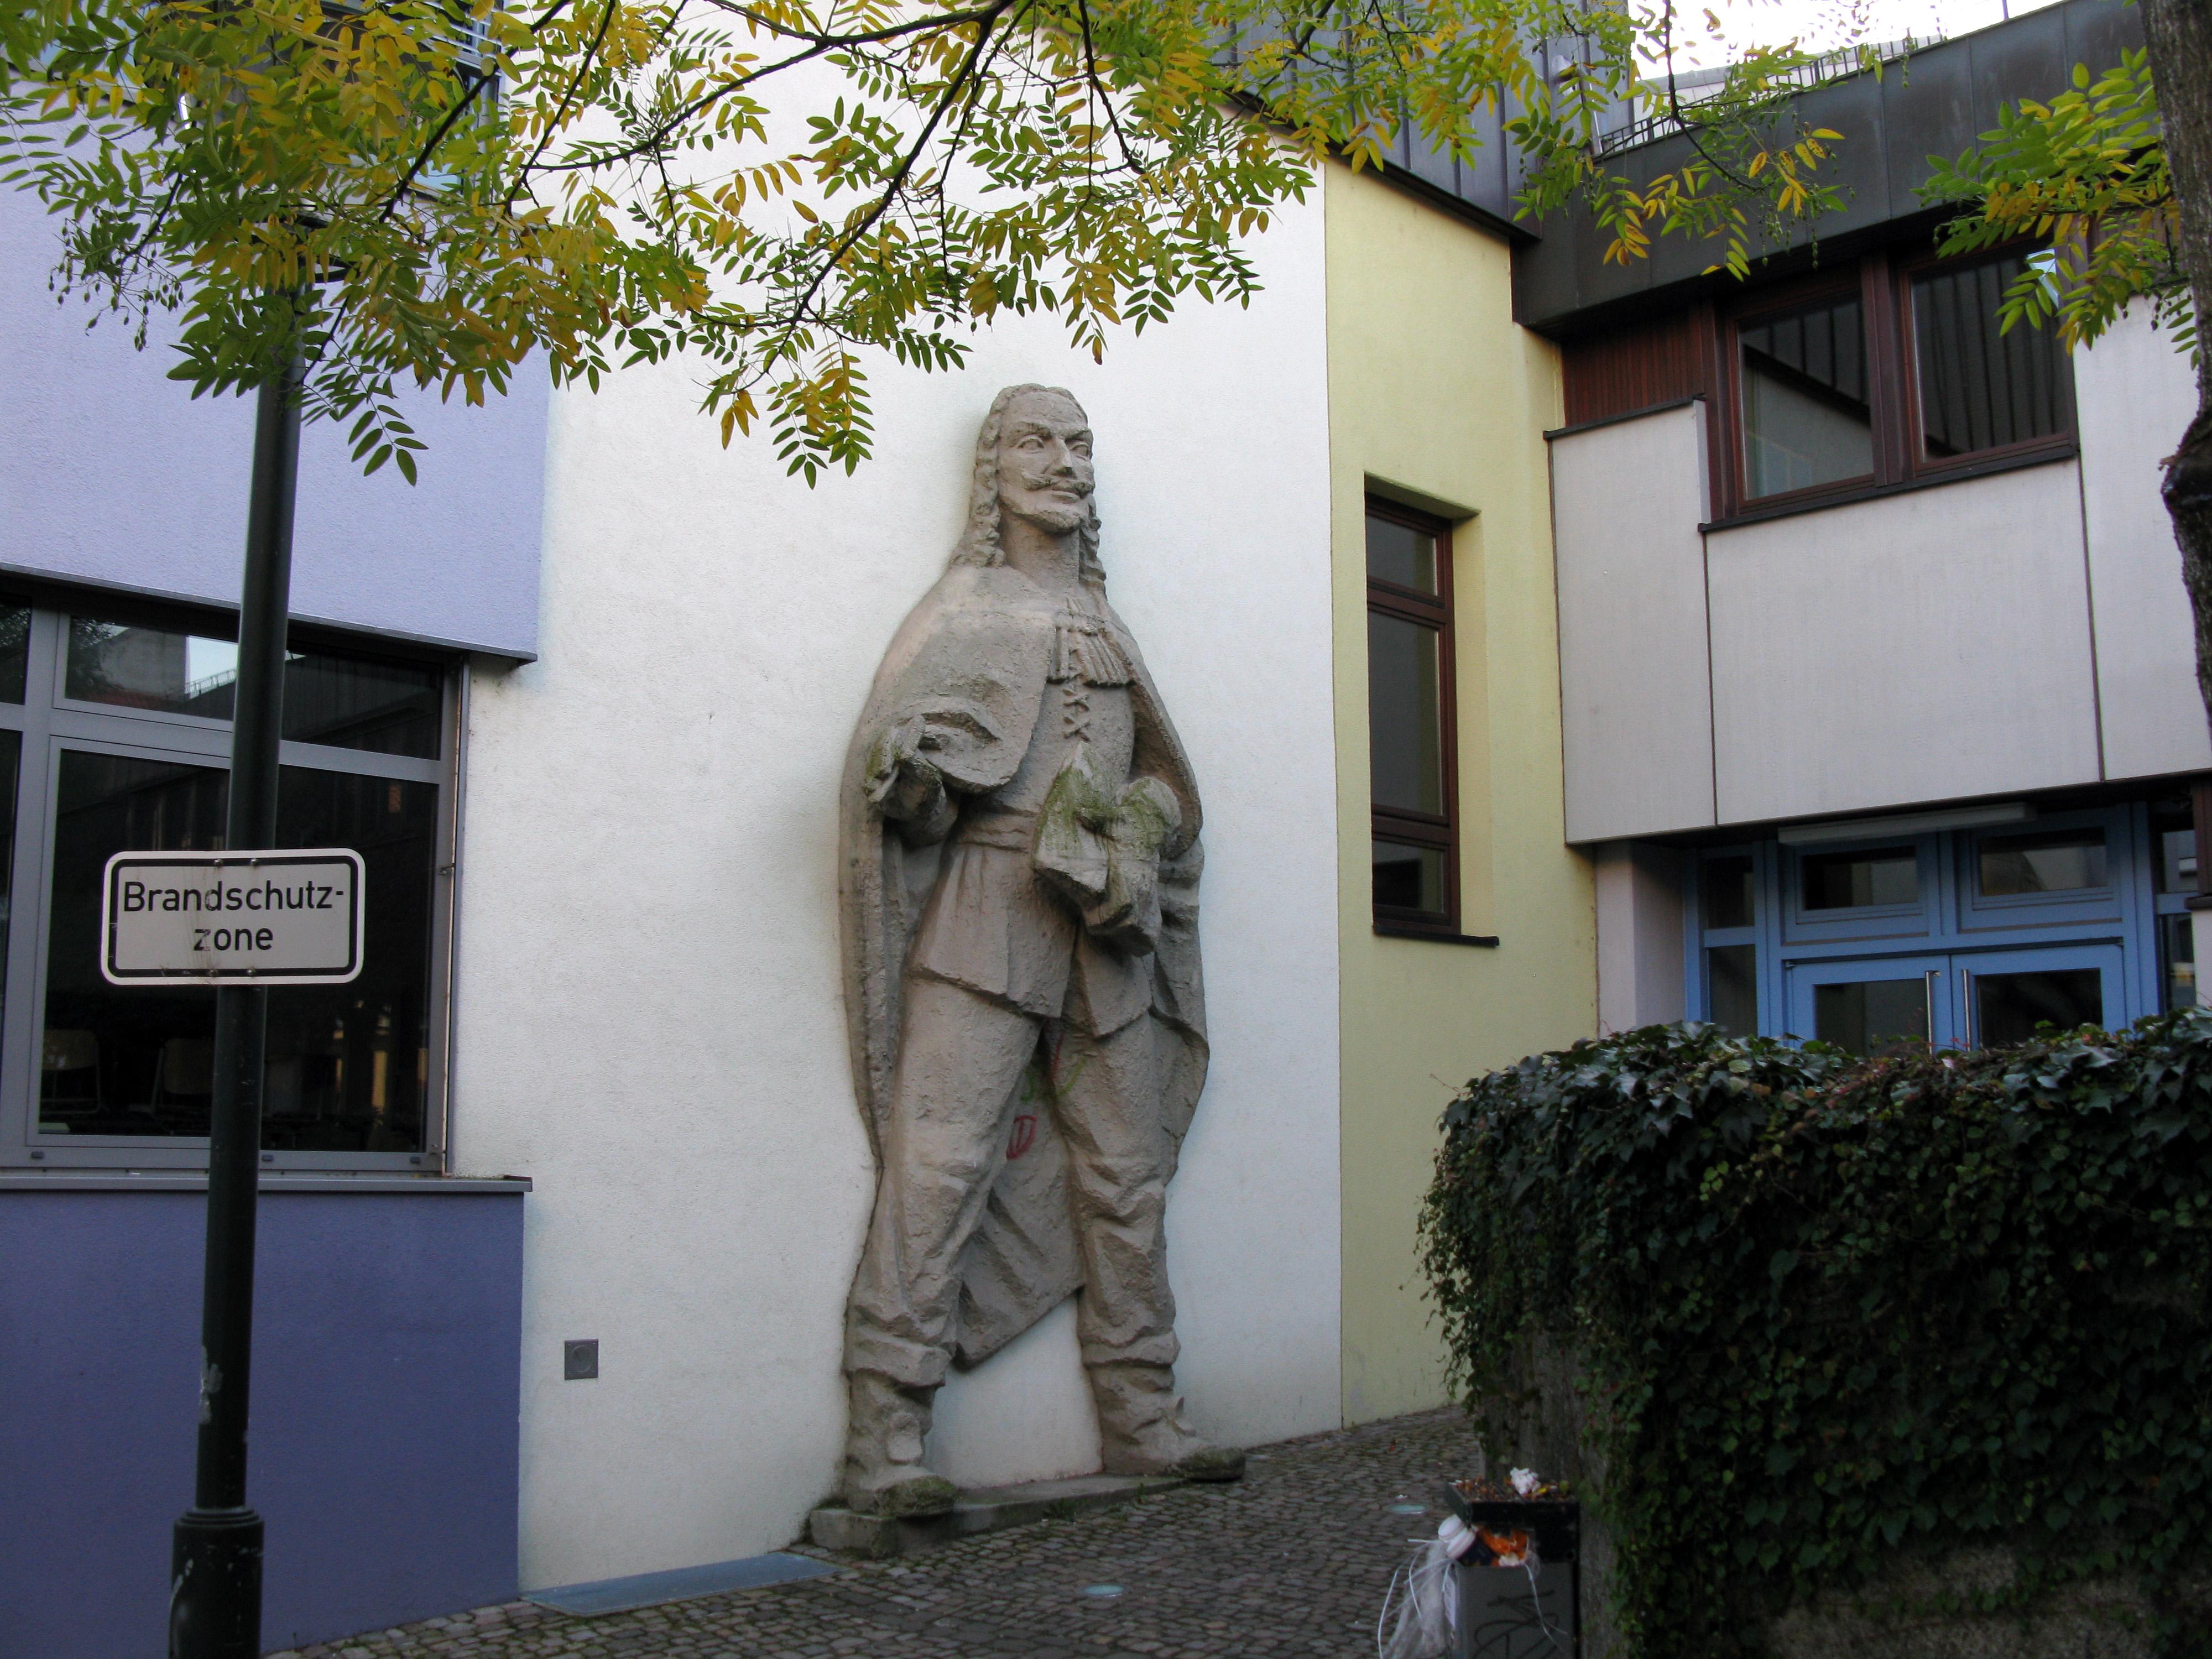 File:Grimmelshausengymnasium.jpg - Wikimedia Commons